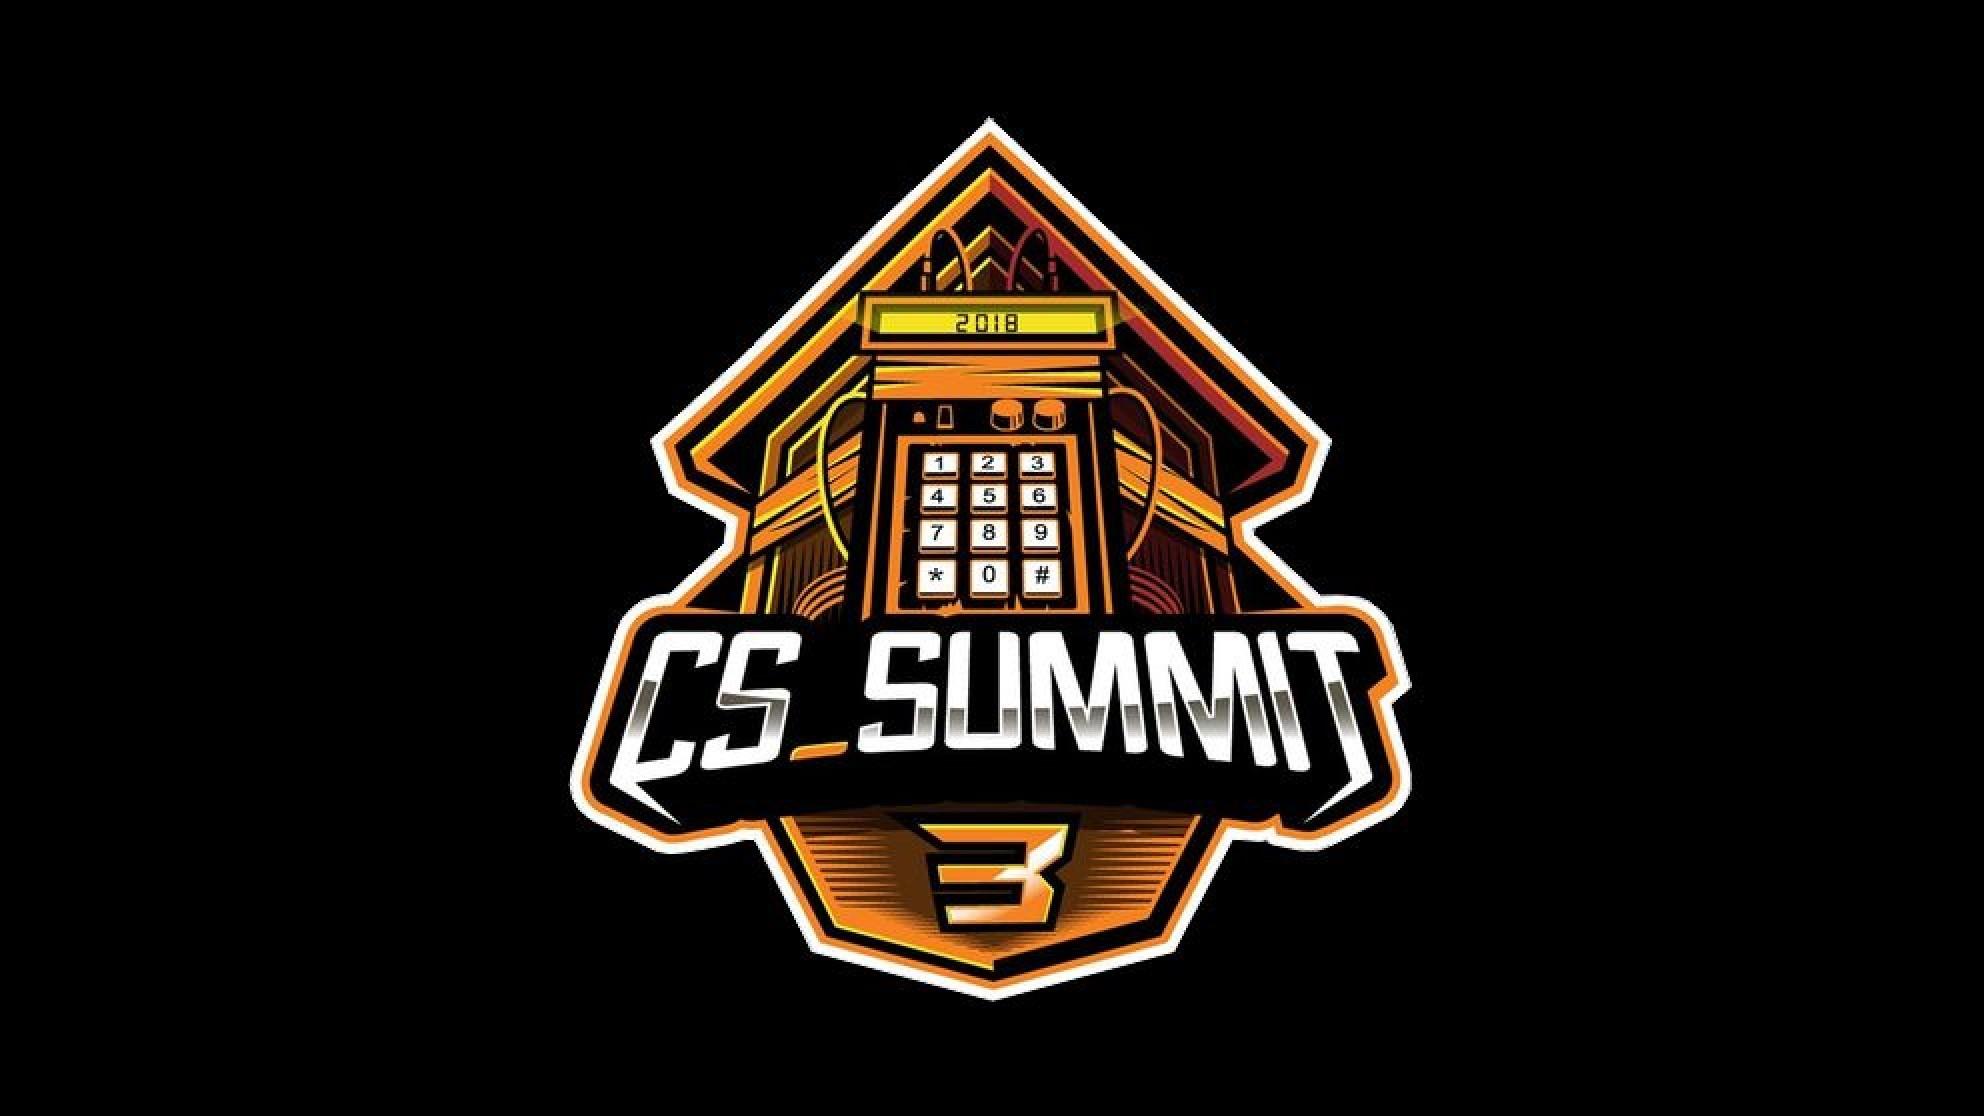 cs_summit 3 - Day 1 Recap